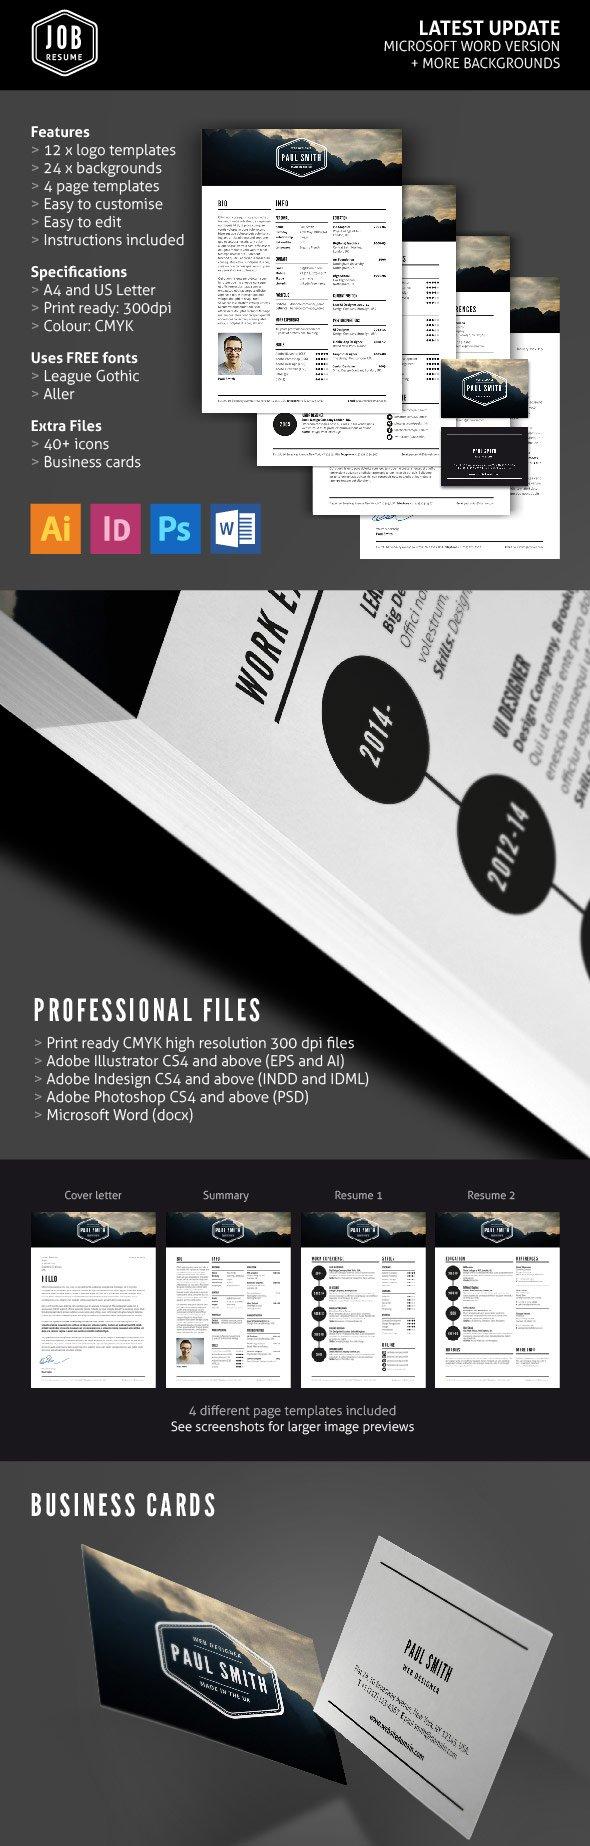 Job Resume Template Set With Logos Business Cards